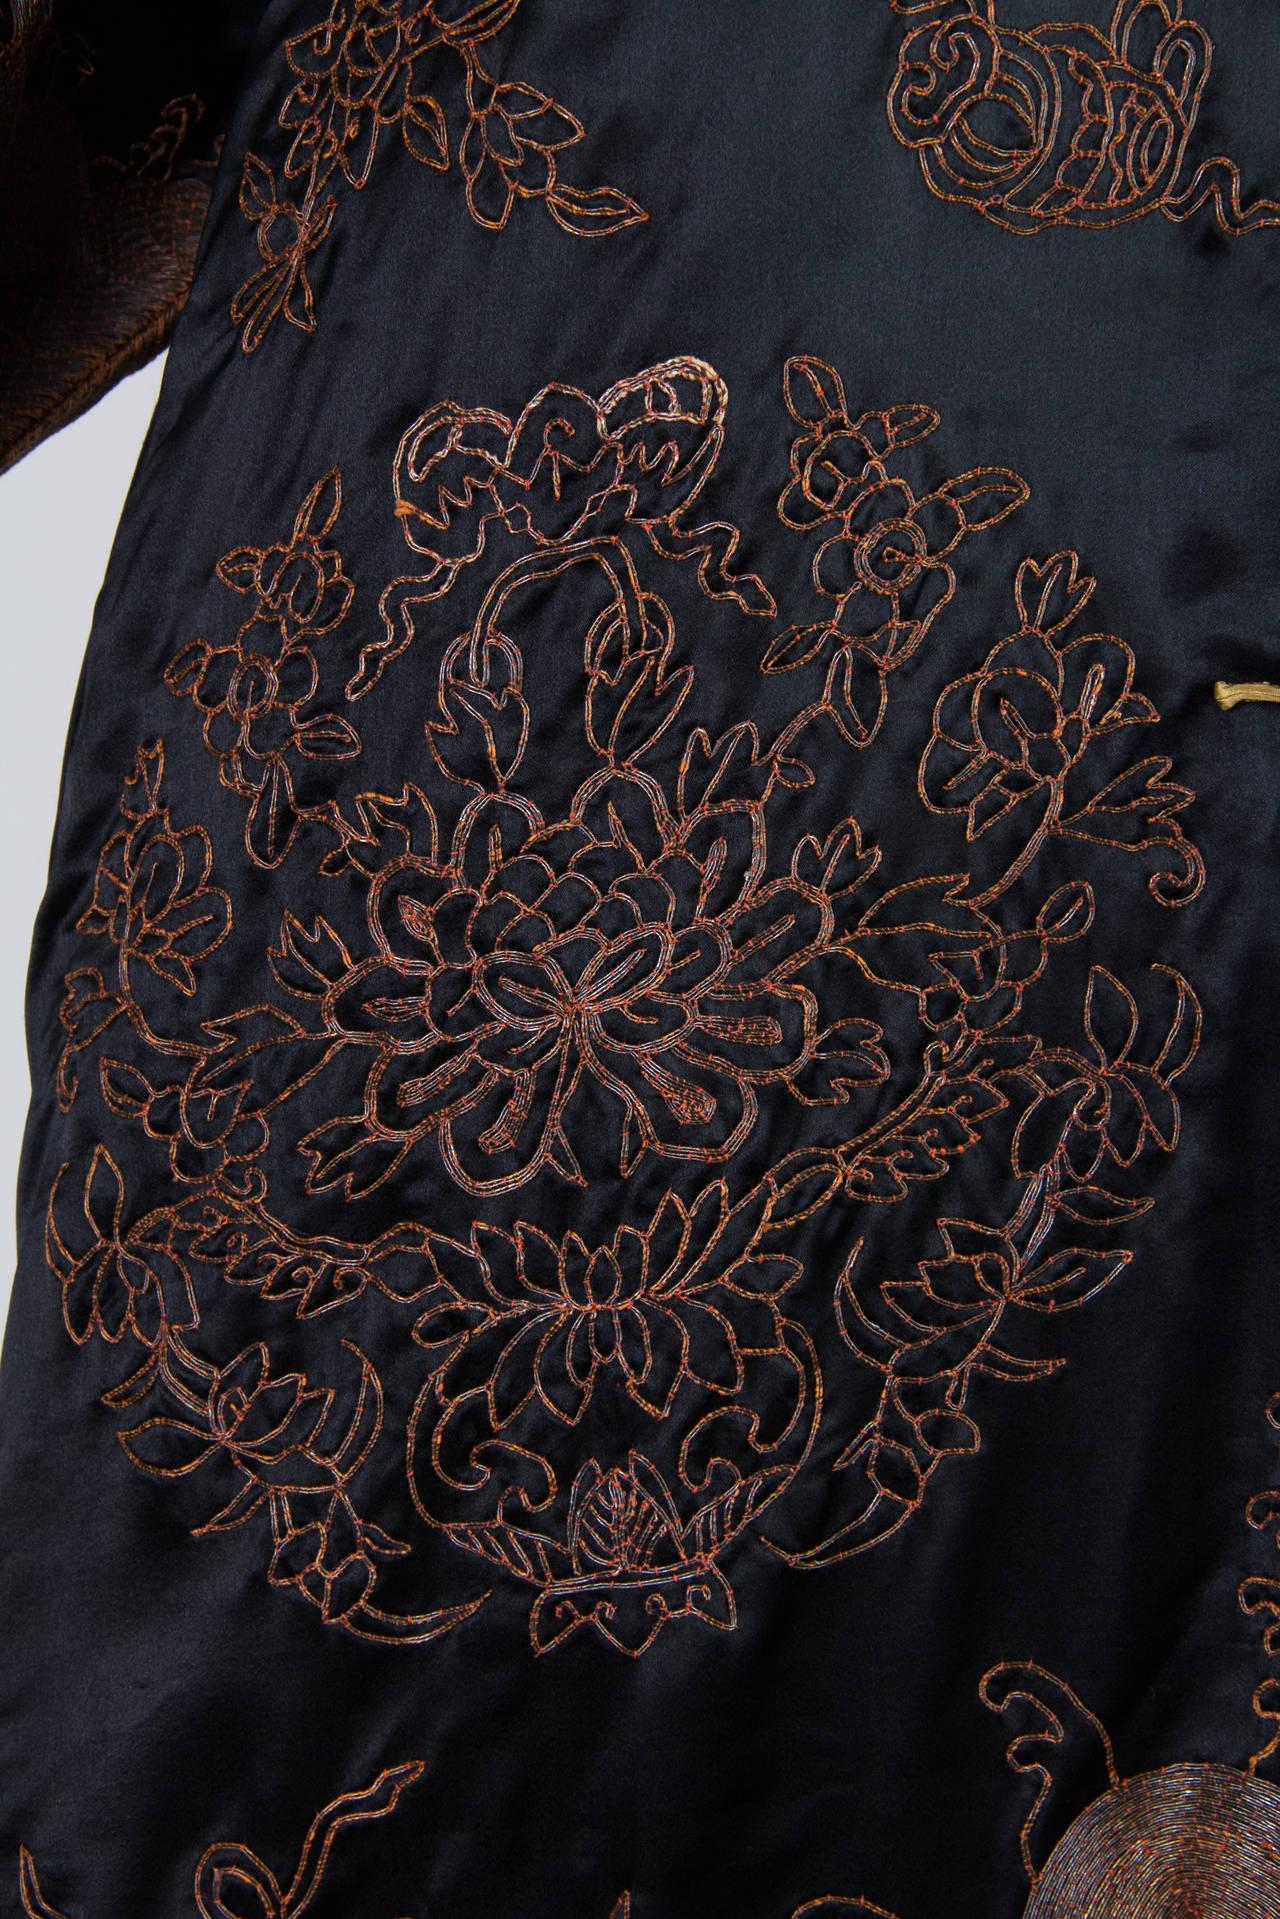 Early Chinese Embroidered Jacket Kimono style 6